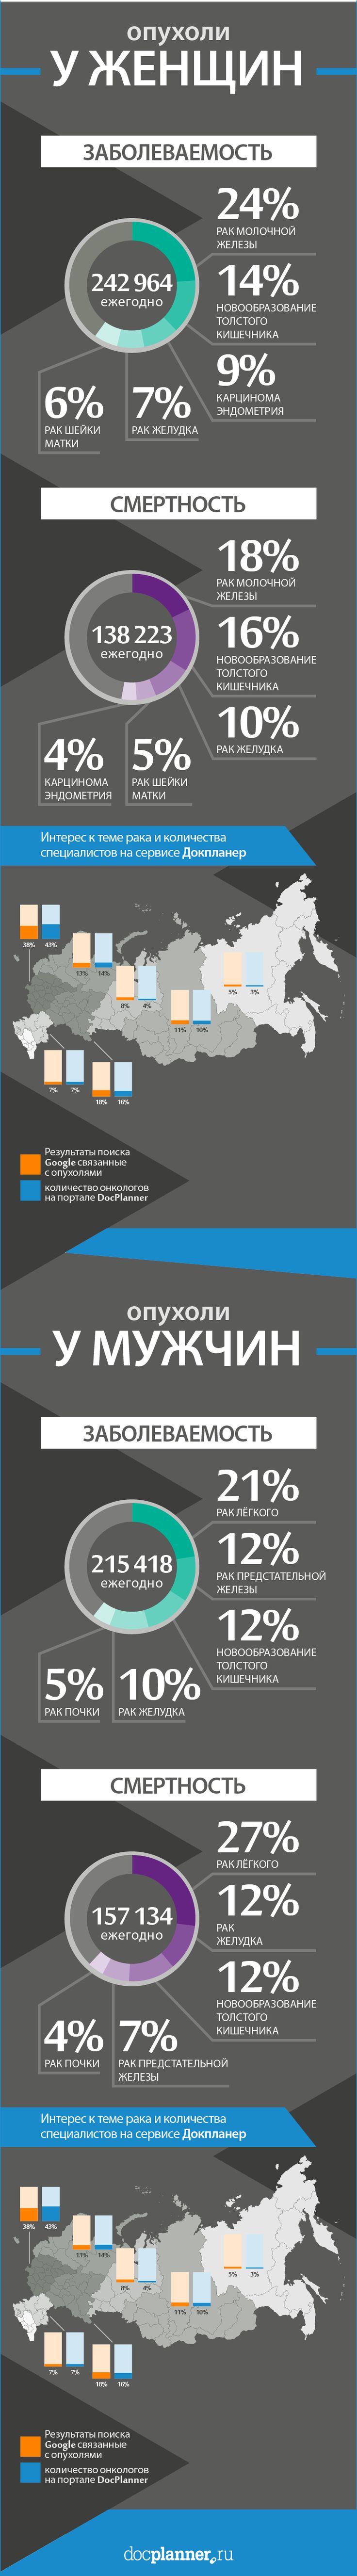 Заболеваемость раком среди женщин и мужчин, интерес к теме рака и количество онкологов на сайте: http://www.docplanner.ru/